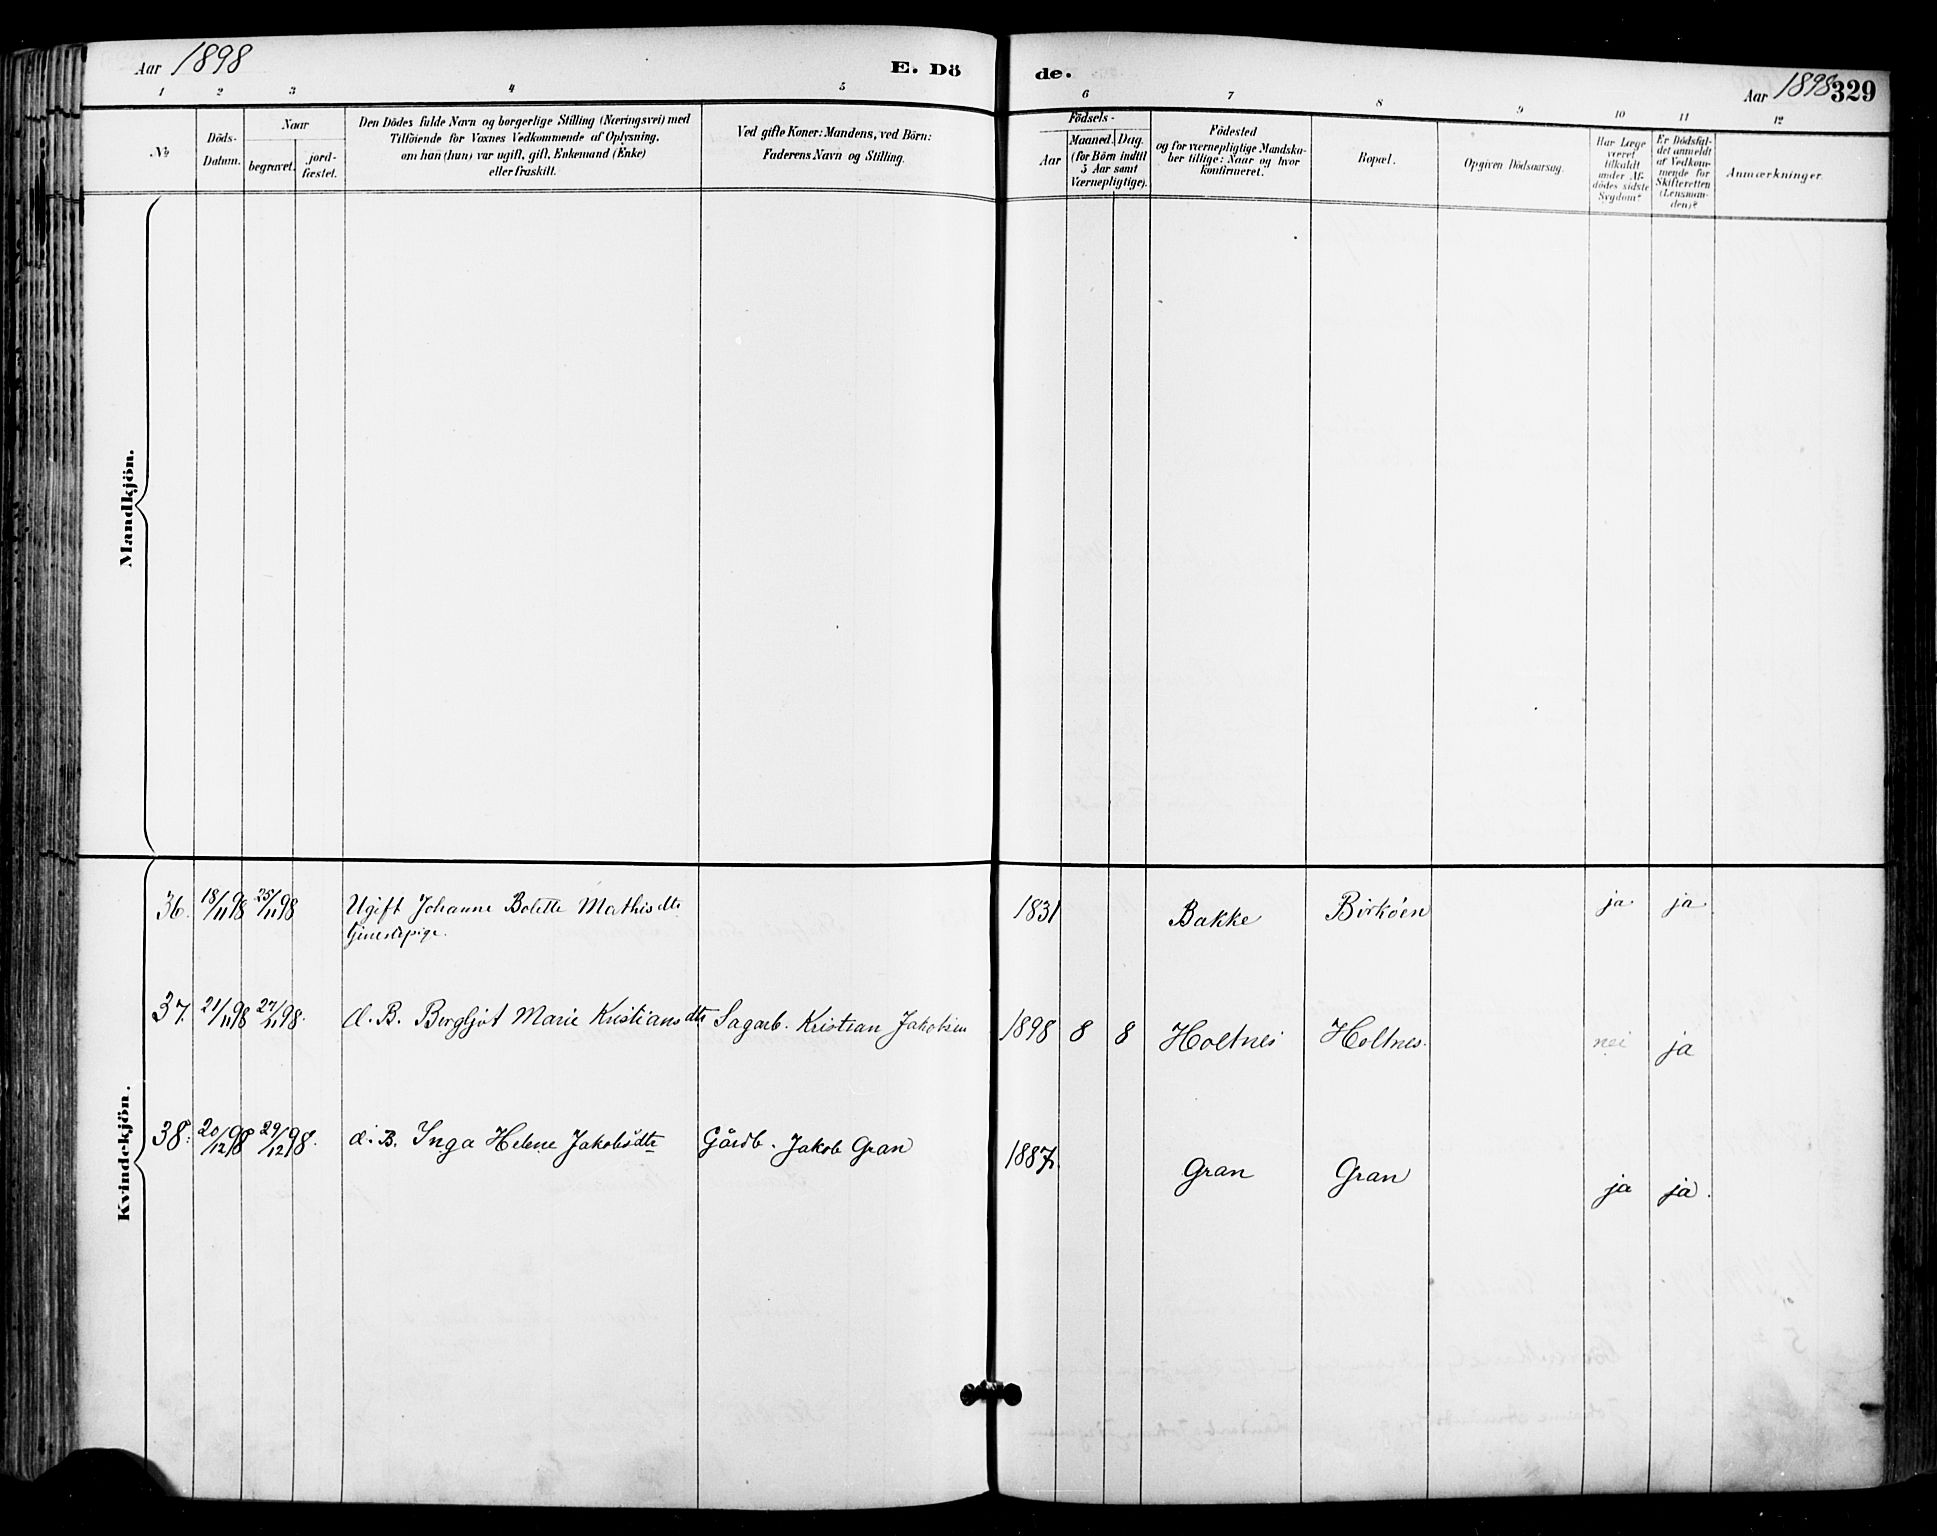 SAKO, Sande Kirkebøker, F/Fa/L0007: Parish register (official) no. 7, 1888-1903, p. 329